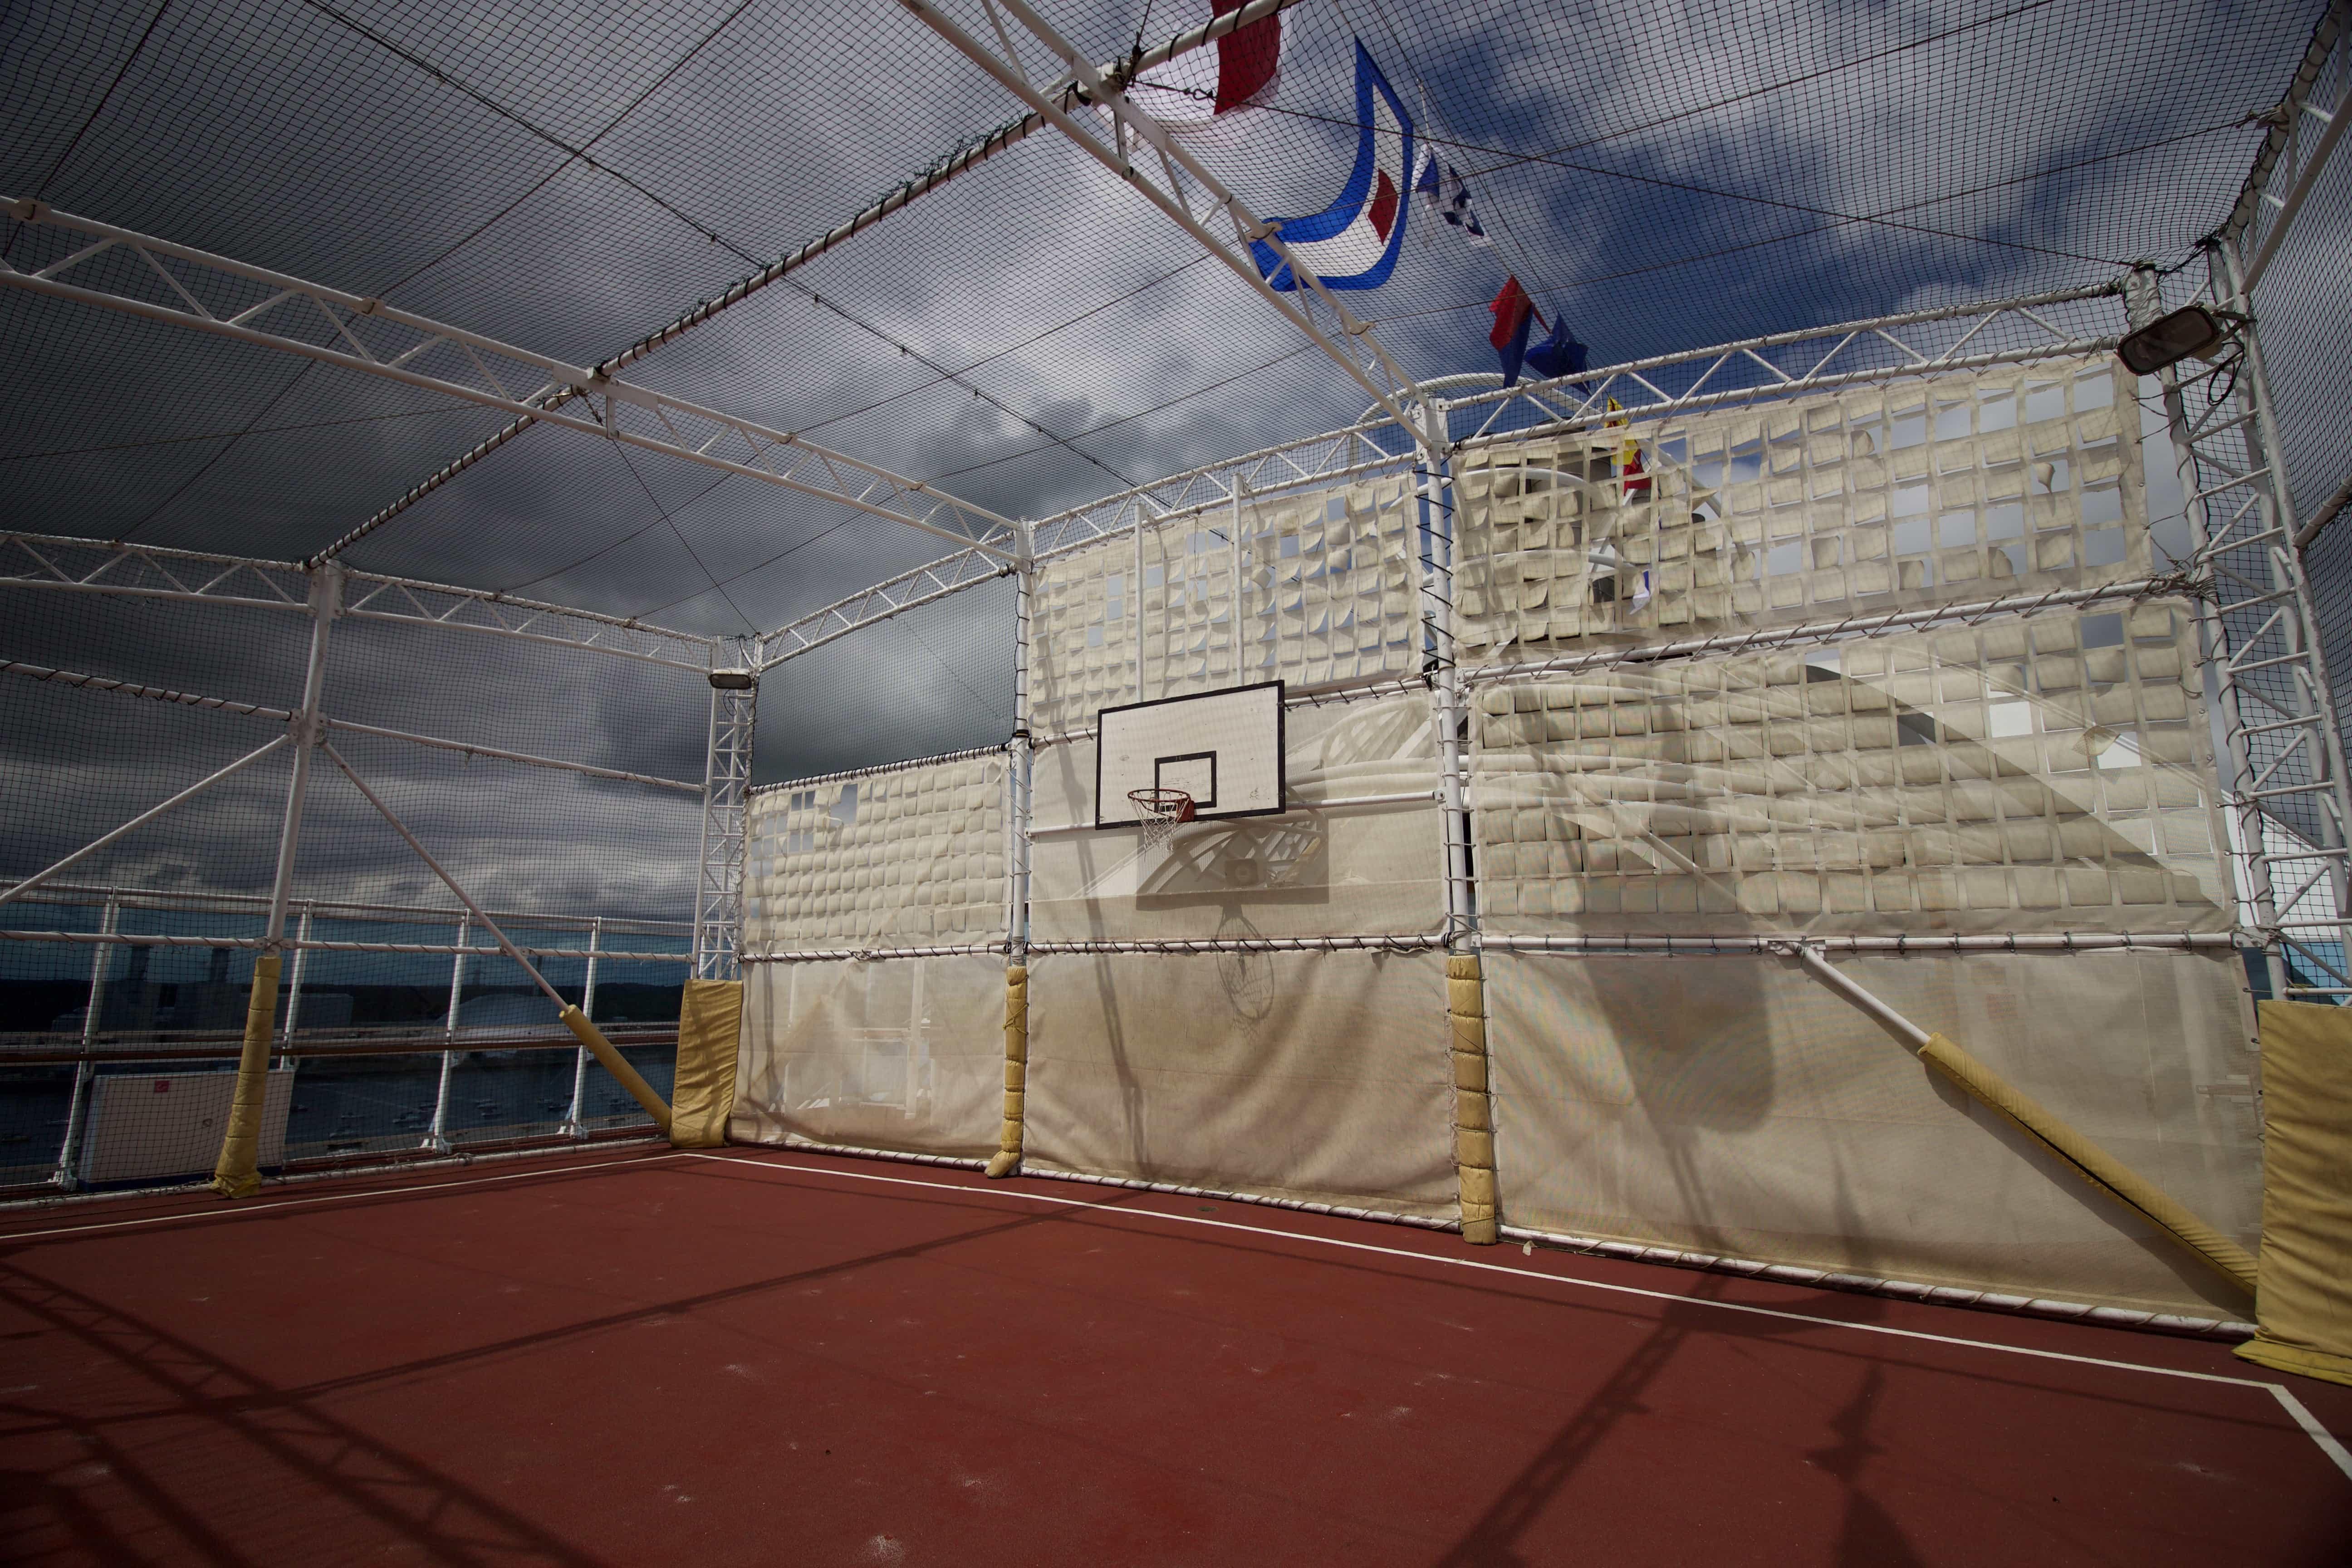 caribbean princess sports court basketball